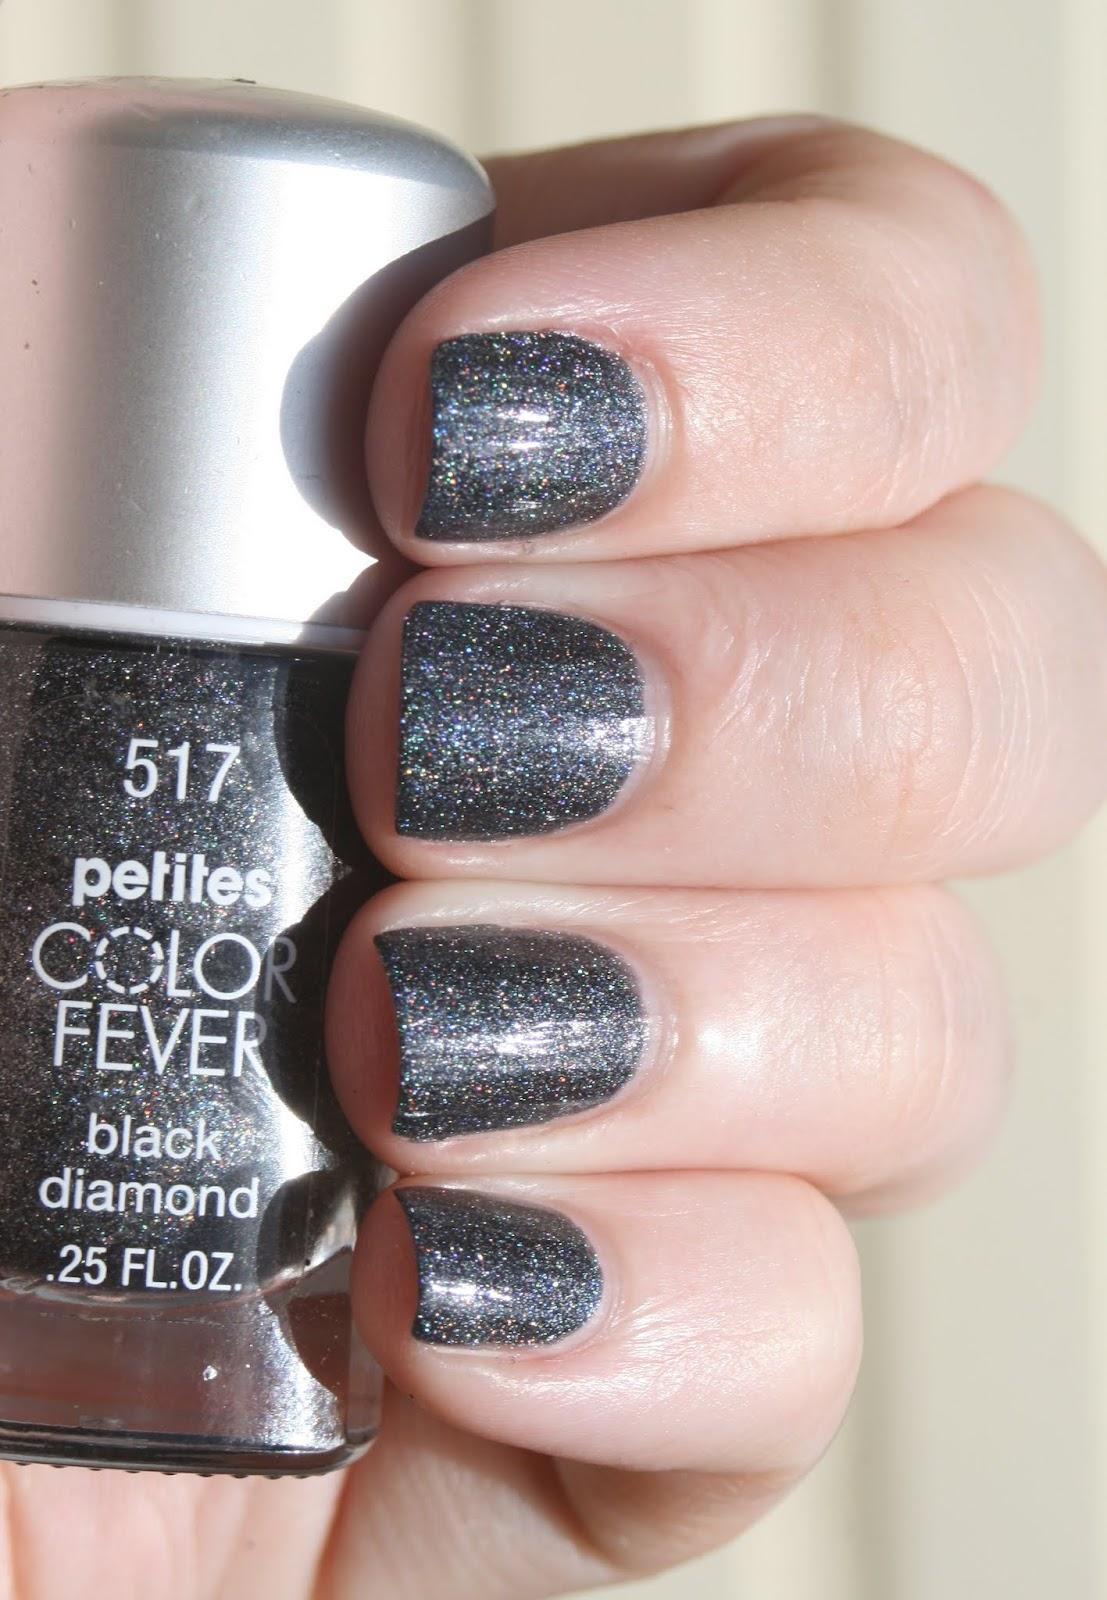 Petites Color Fever Black Diamond swatch